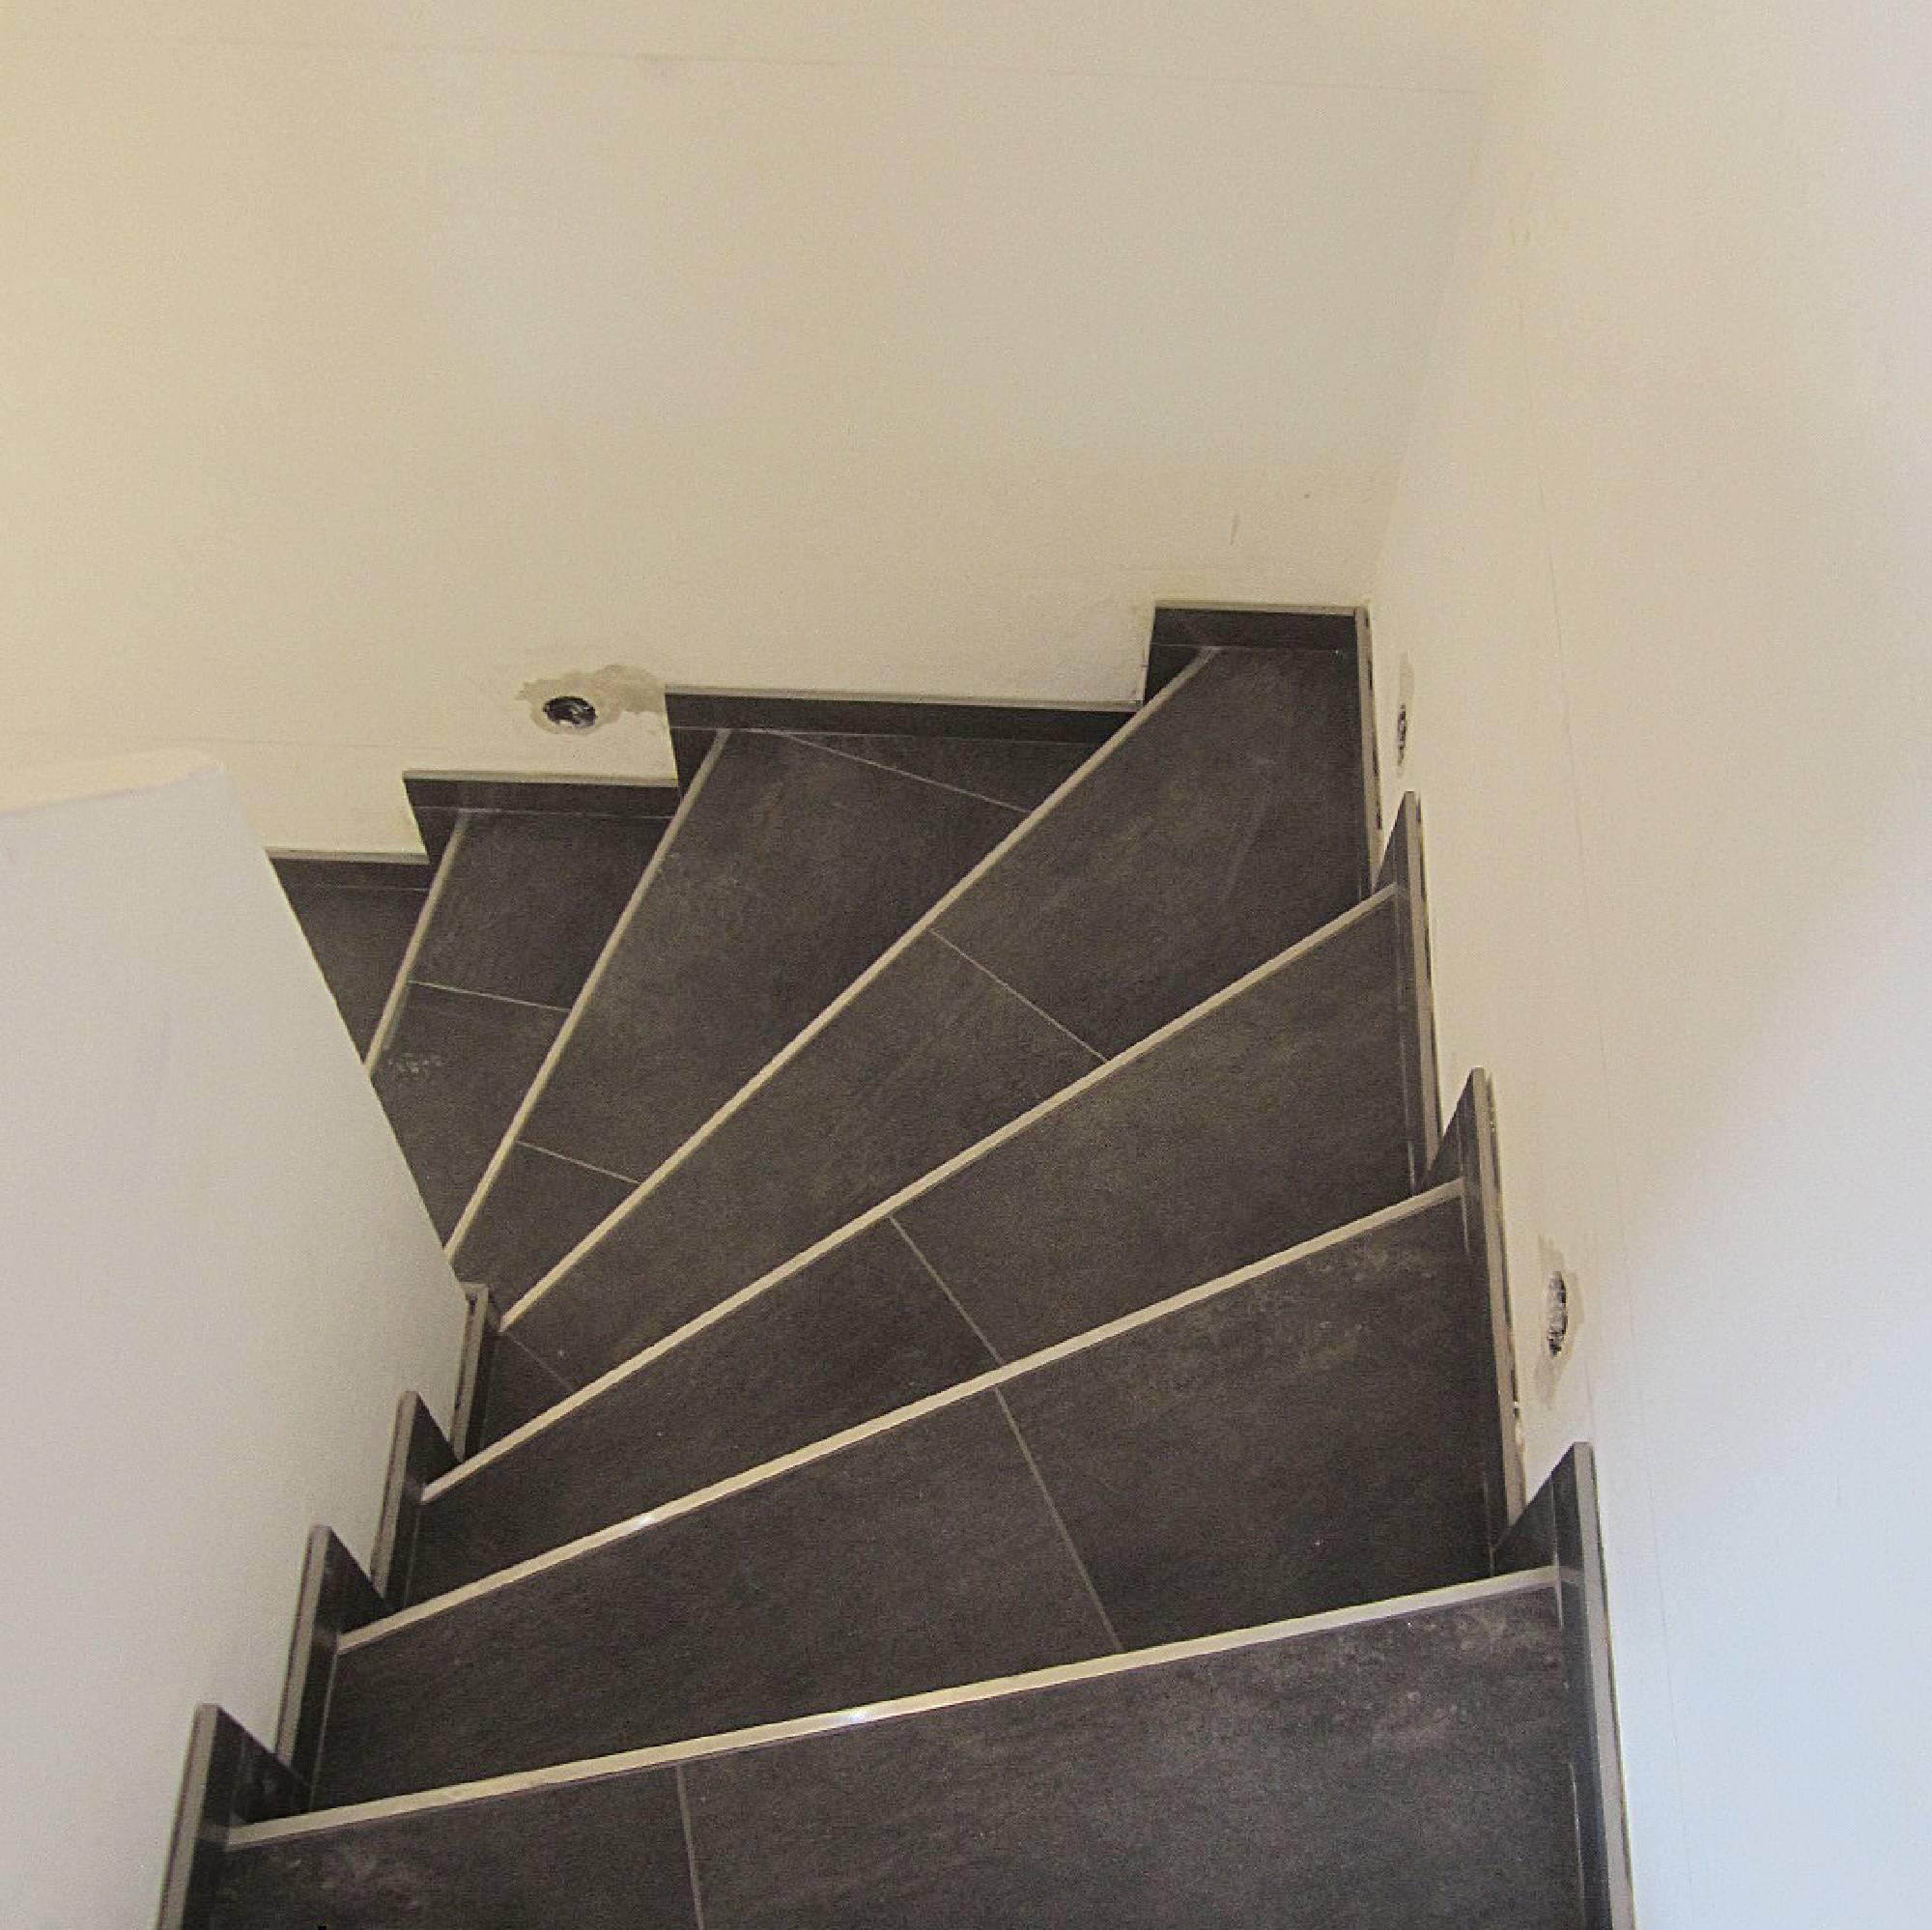 treppe mit fliesen cool best treppe images on pinterest konzepte of fliesen kanten with treppe. Black Bedroom Furniture Sets. Home Design Ideas